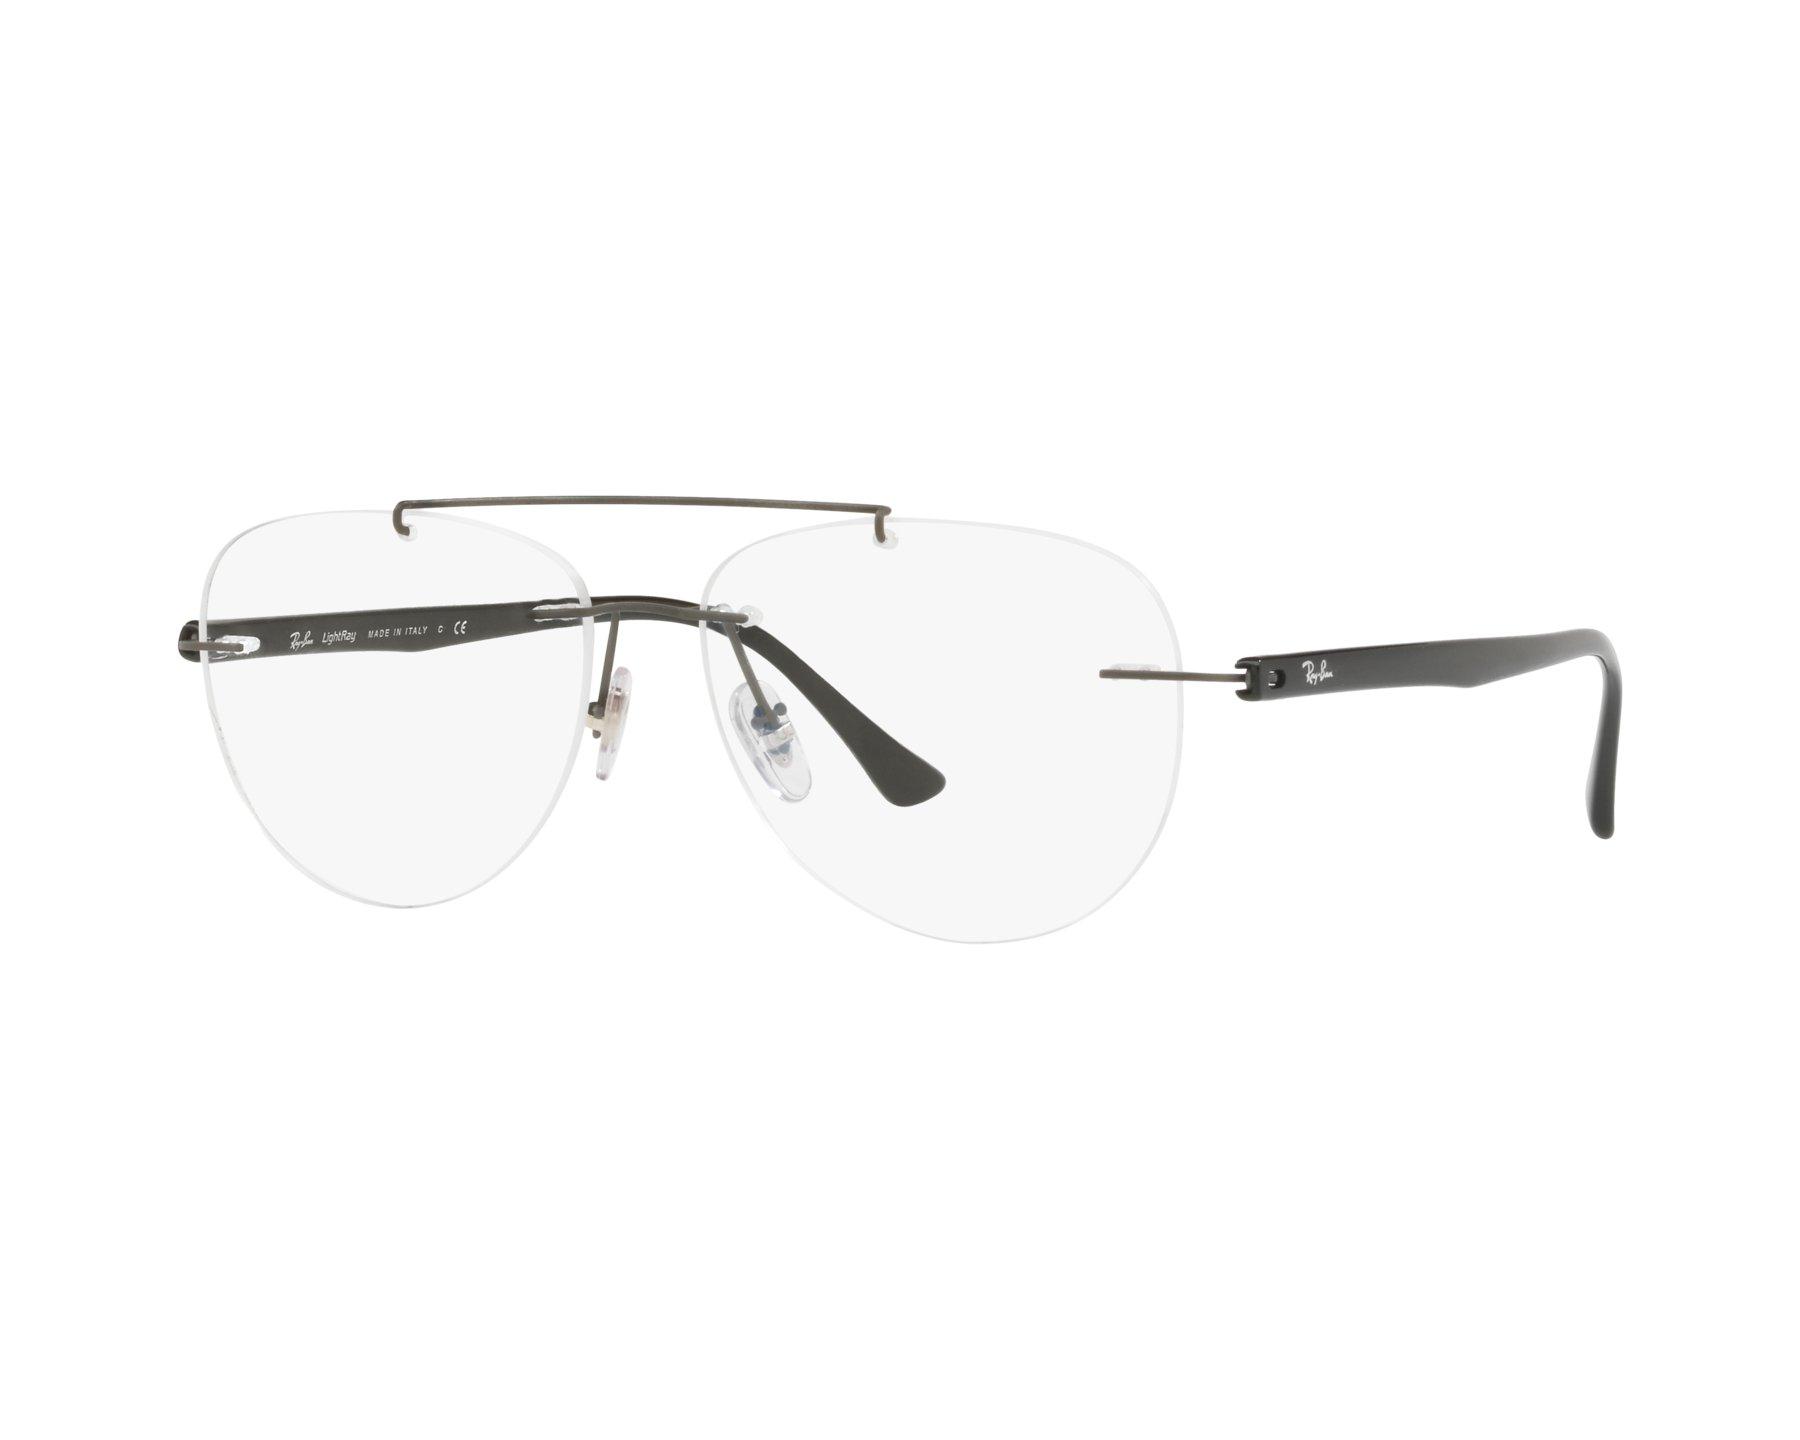 9ace8f2e0ca6 eyeglasses Ray-Ban RX-8749 1128 54-14 Grey Black